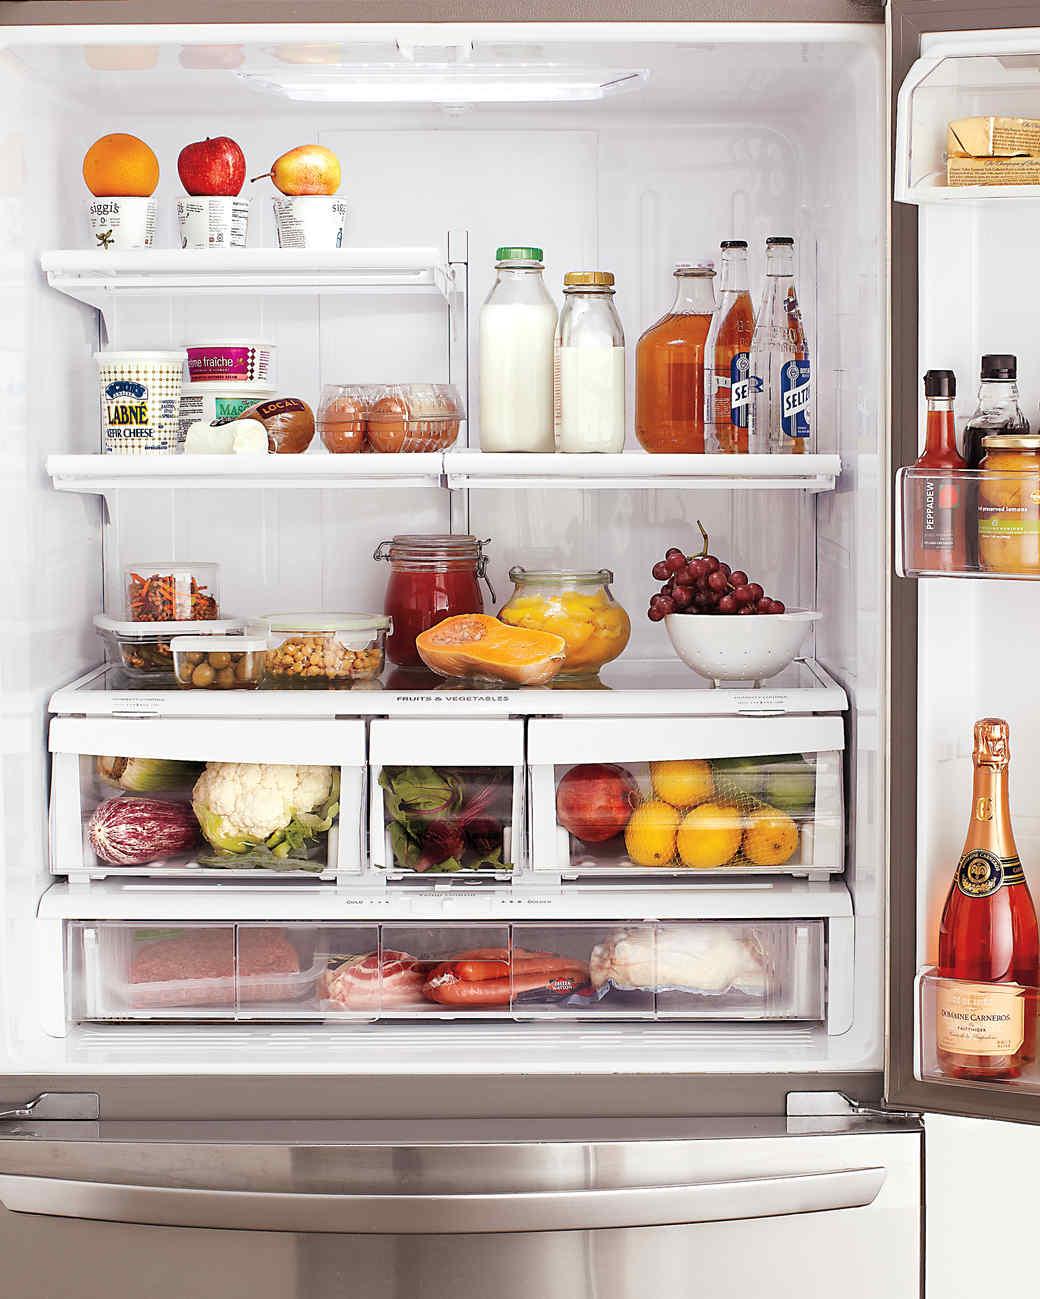 fridge-organization-059-mld110336.jpg